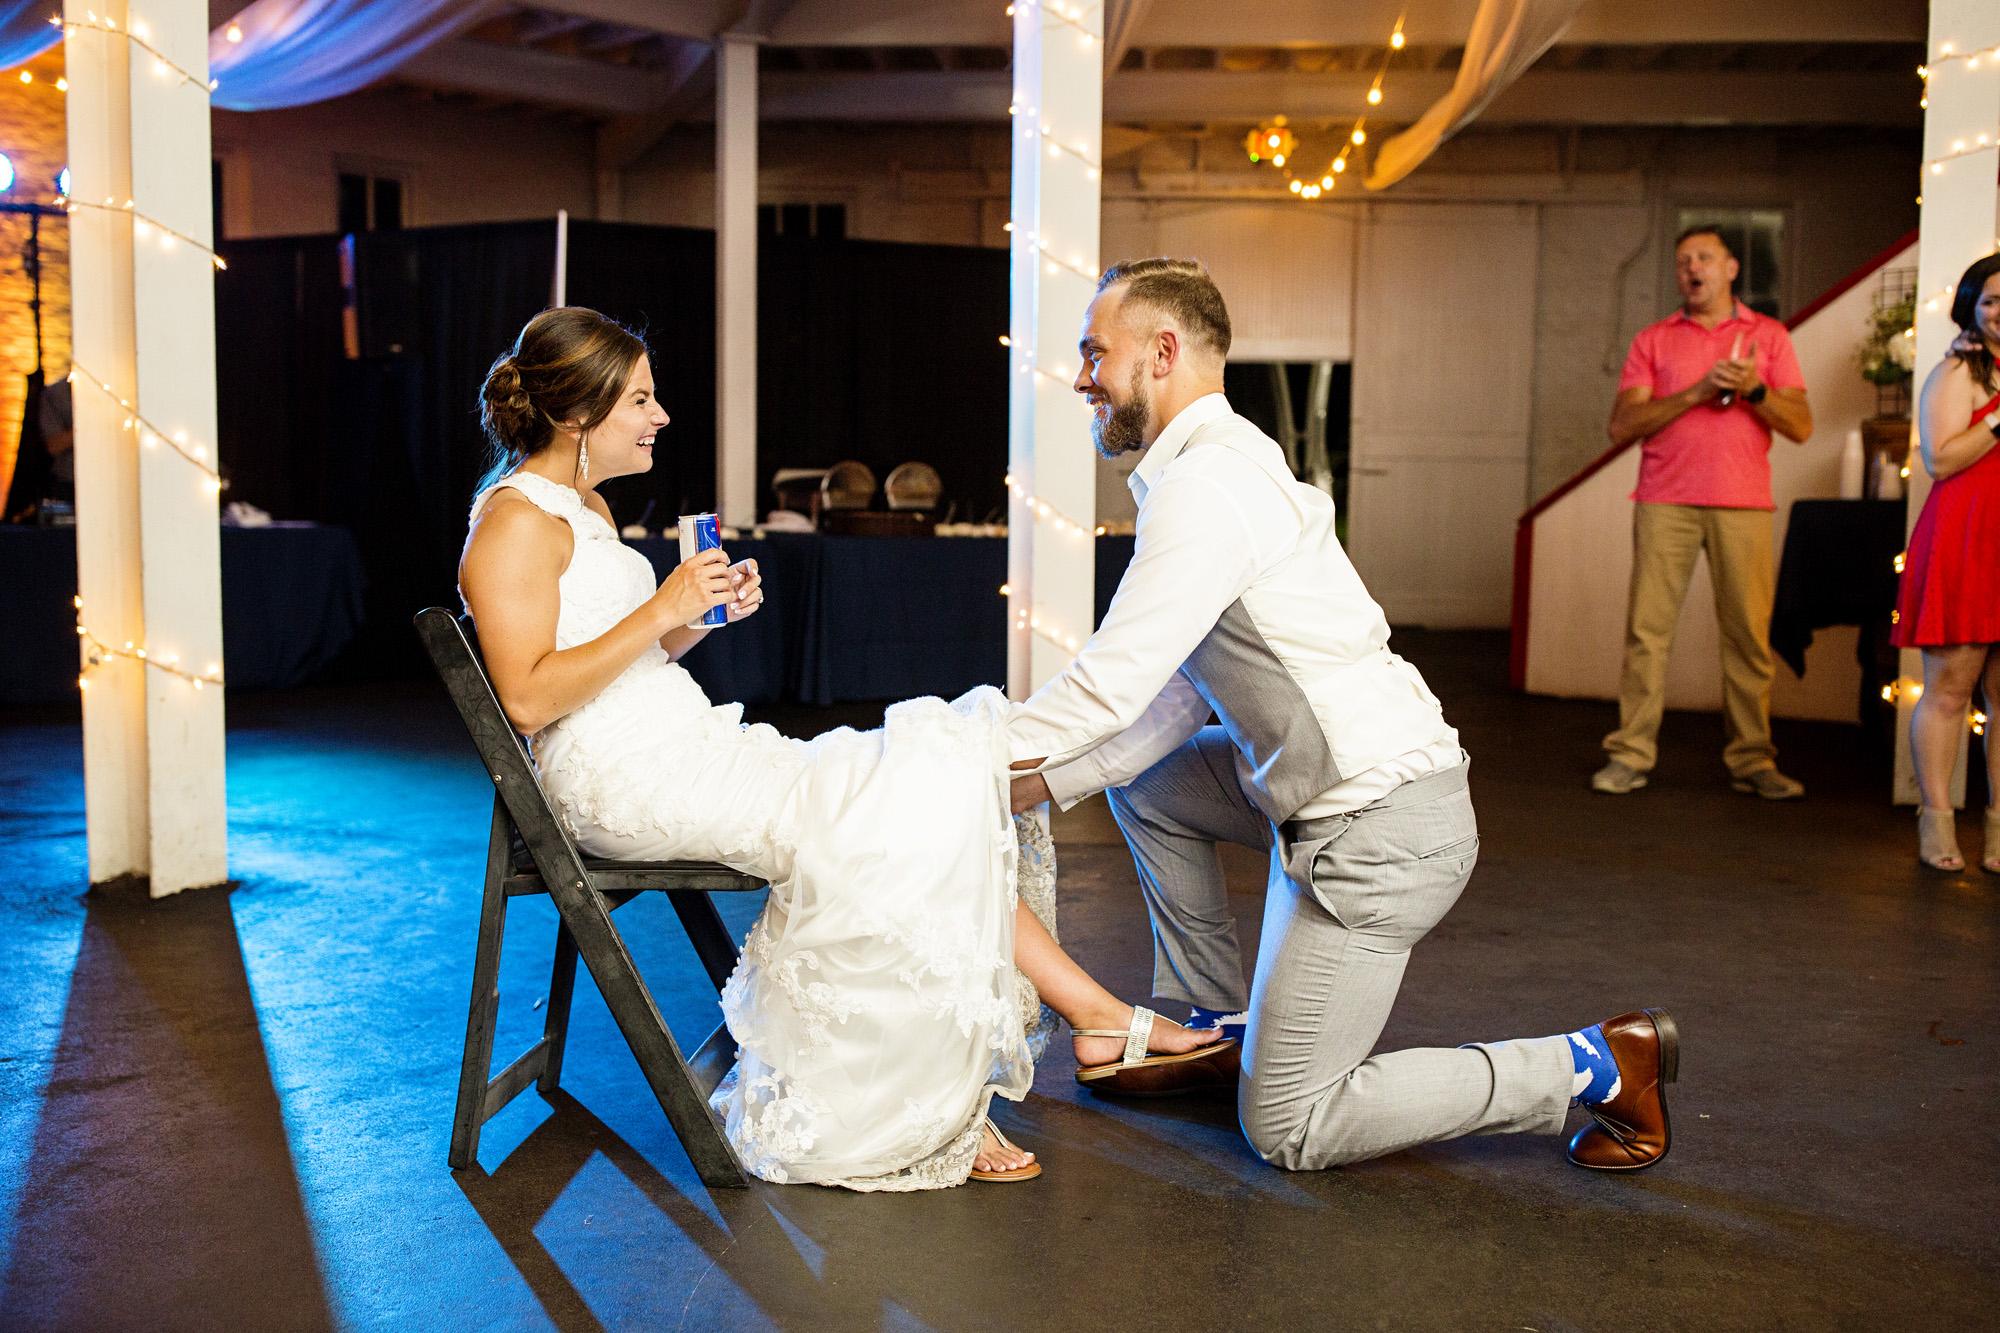 Seriously_Sabrina_Photography_Lexington_Kentucky_Round_Barn_Red_Mile_Stable_of_Memories_Wedding_Hart_129.jpg